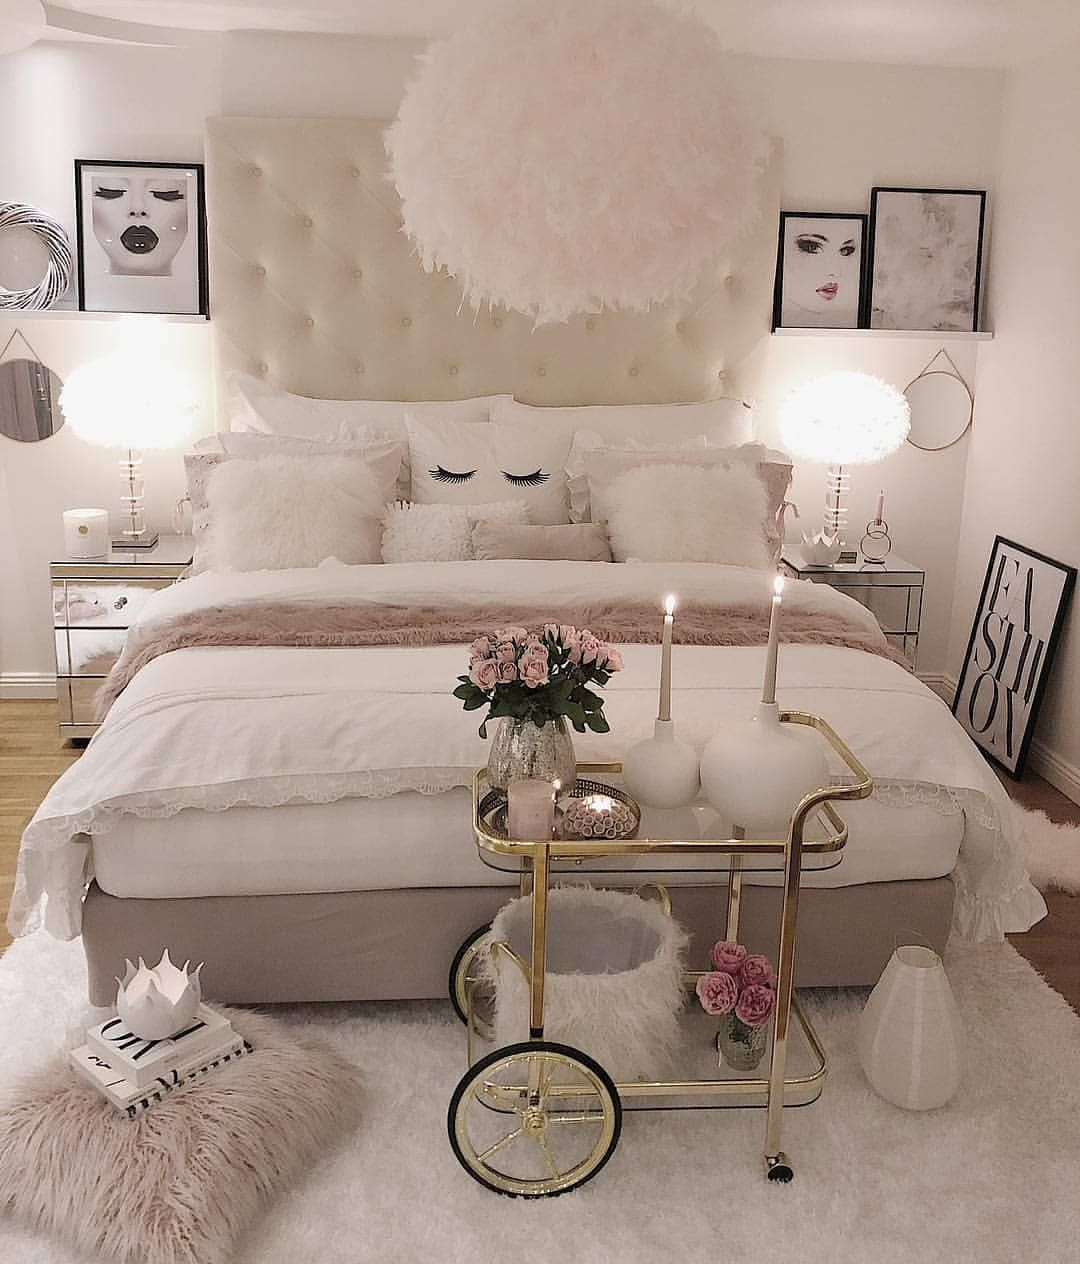 Fashion Fashionexe Instagram Posts Videos Stories On Poshinsta Com Cozy Poshinsta Bedroom Decor Home Decor Bedroom Cozy Home Decorating Simple bedroom decoration view